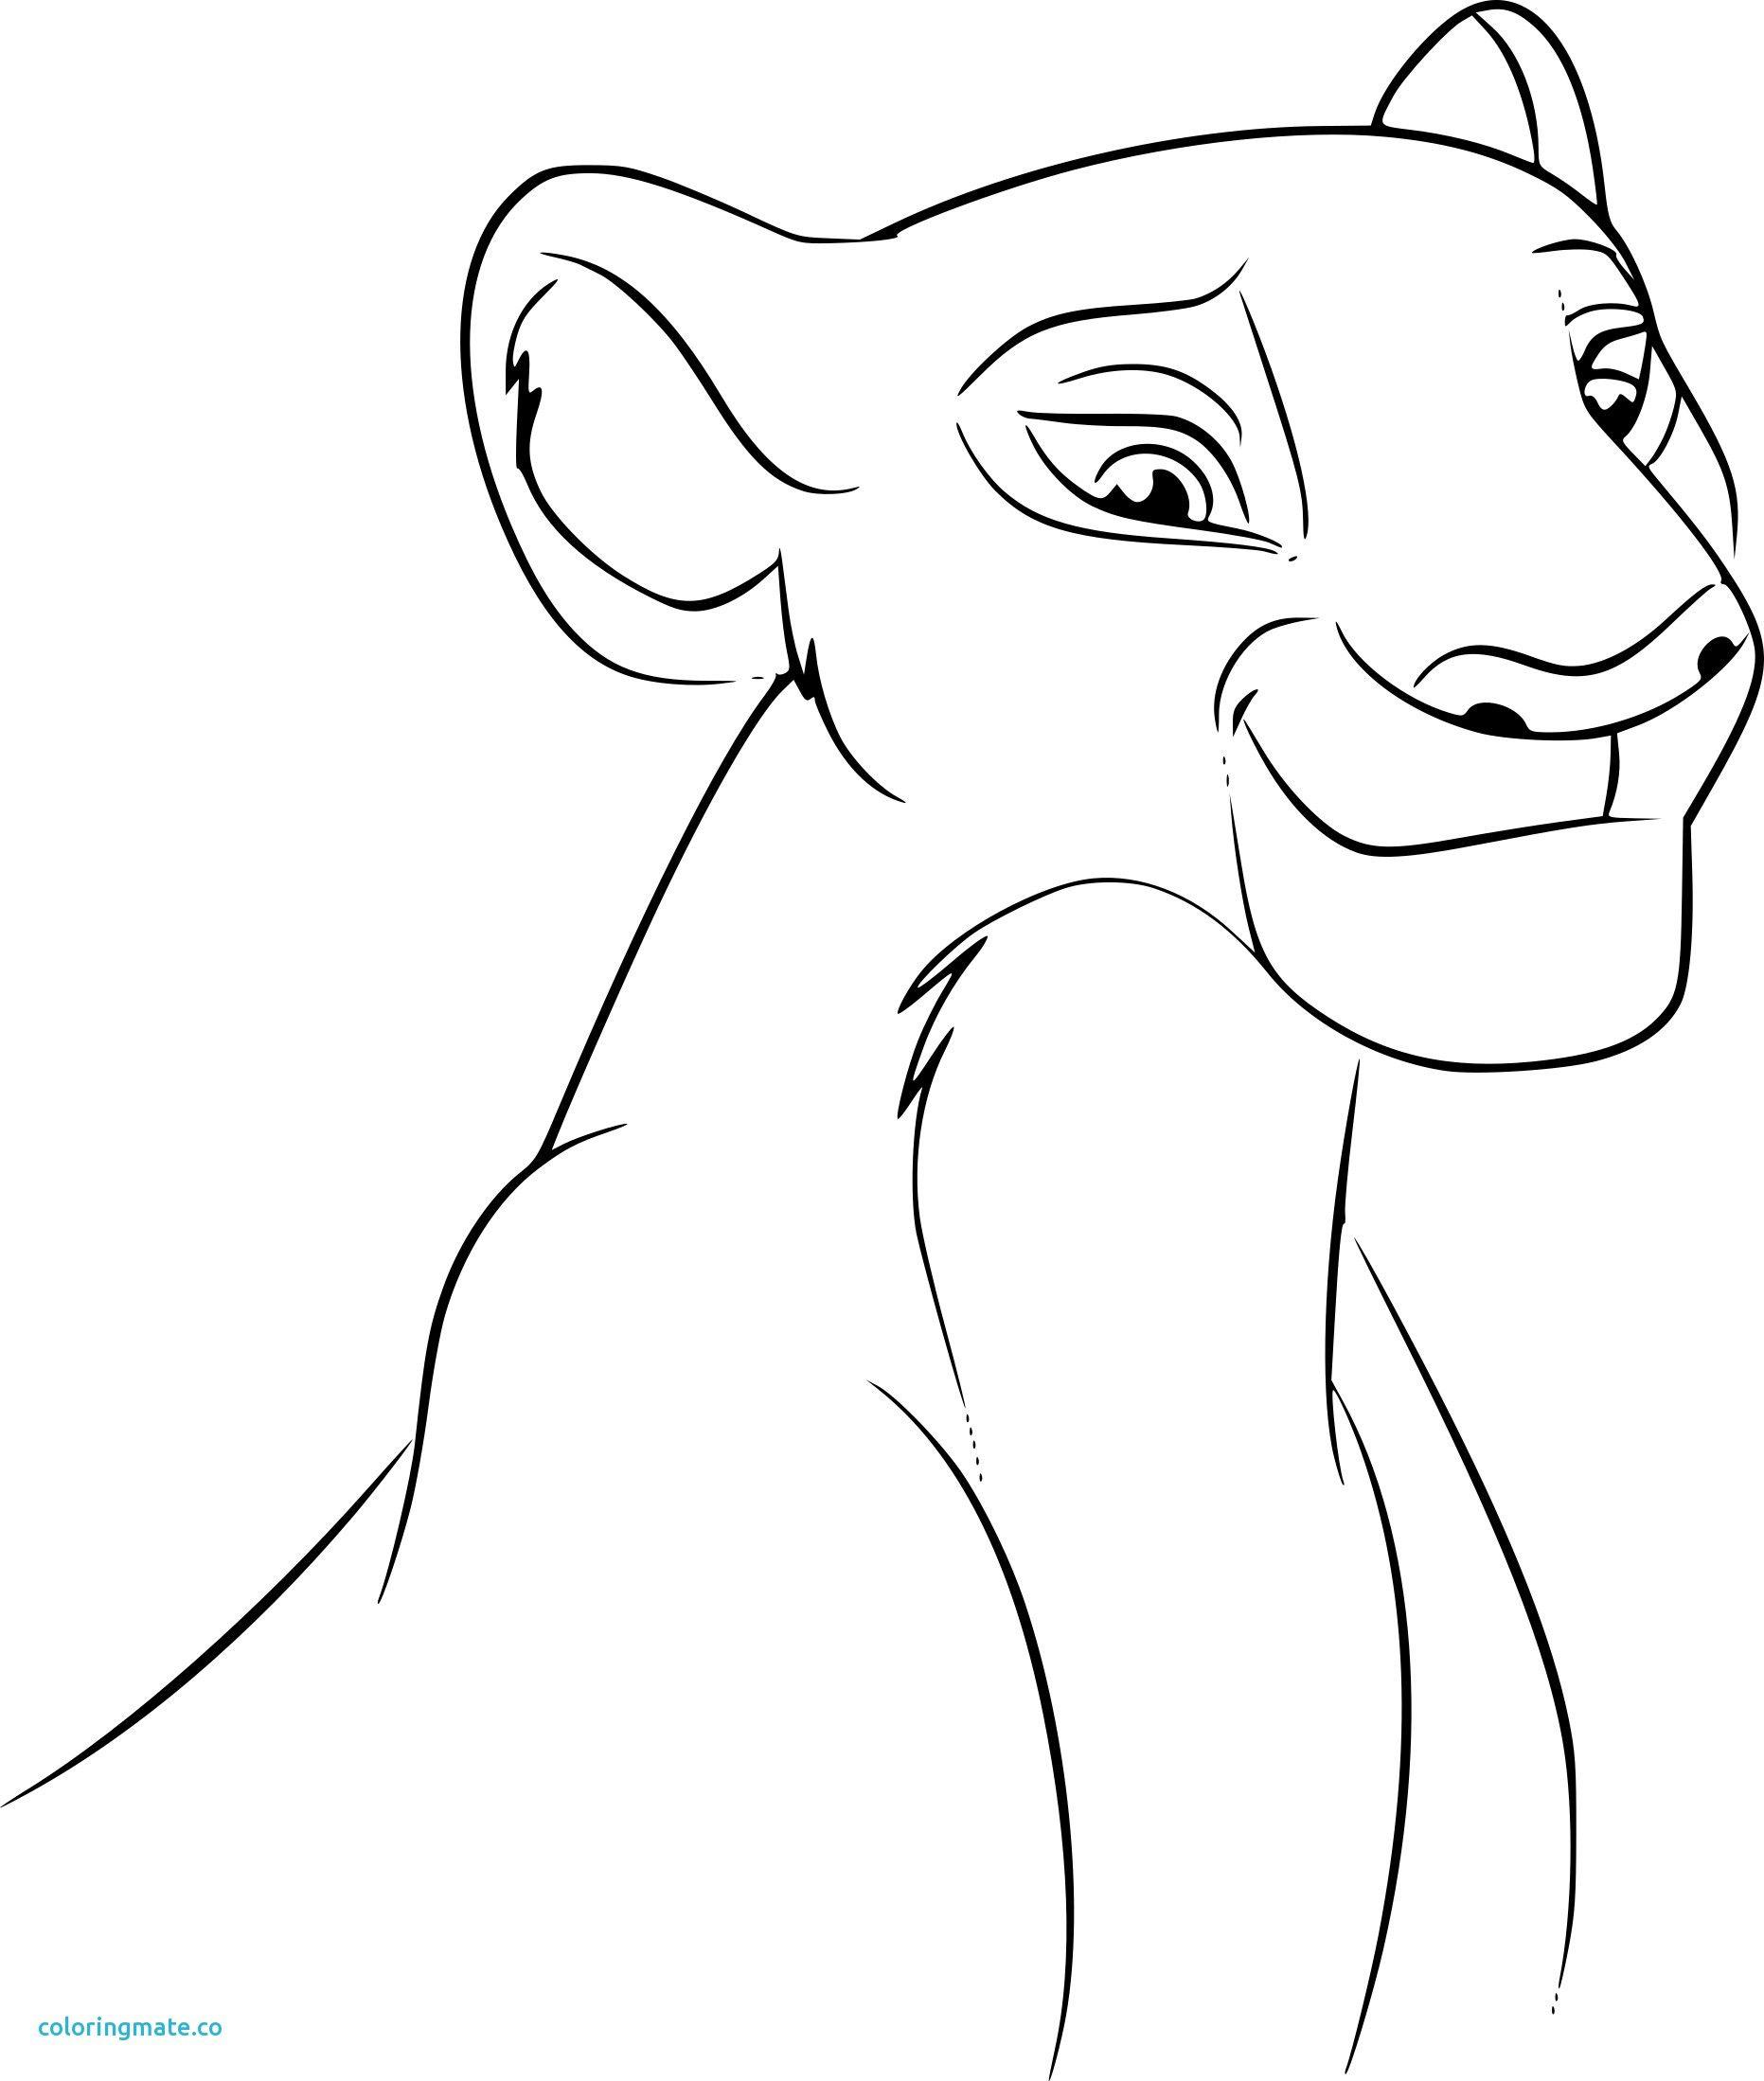 Coloriage Roi Lion Awesome Le Roi Lion Coloriage Nala Collection ...